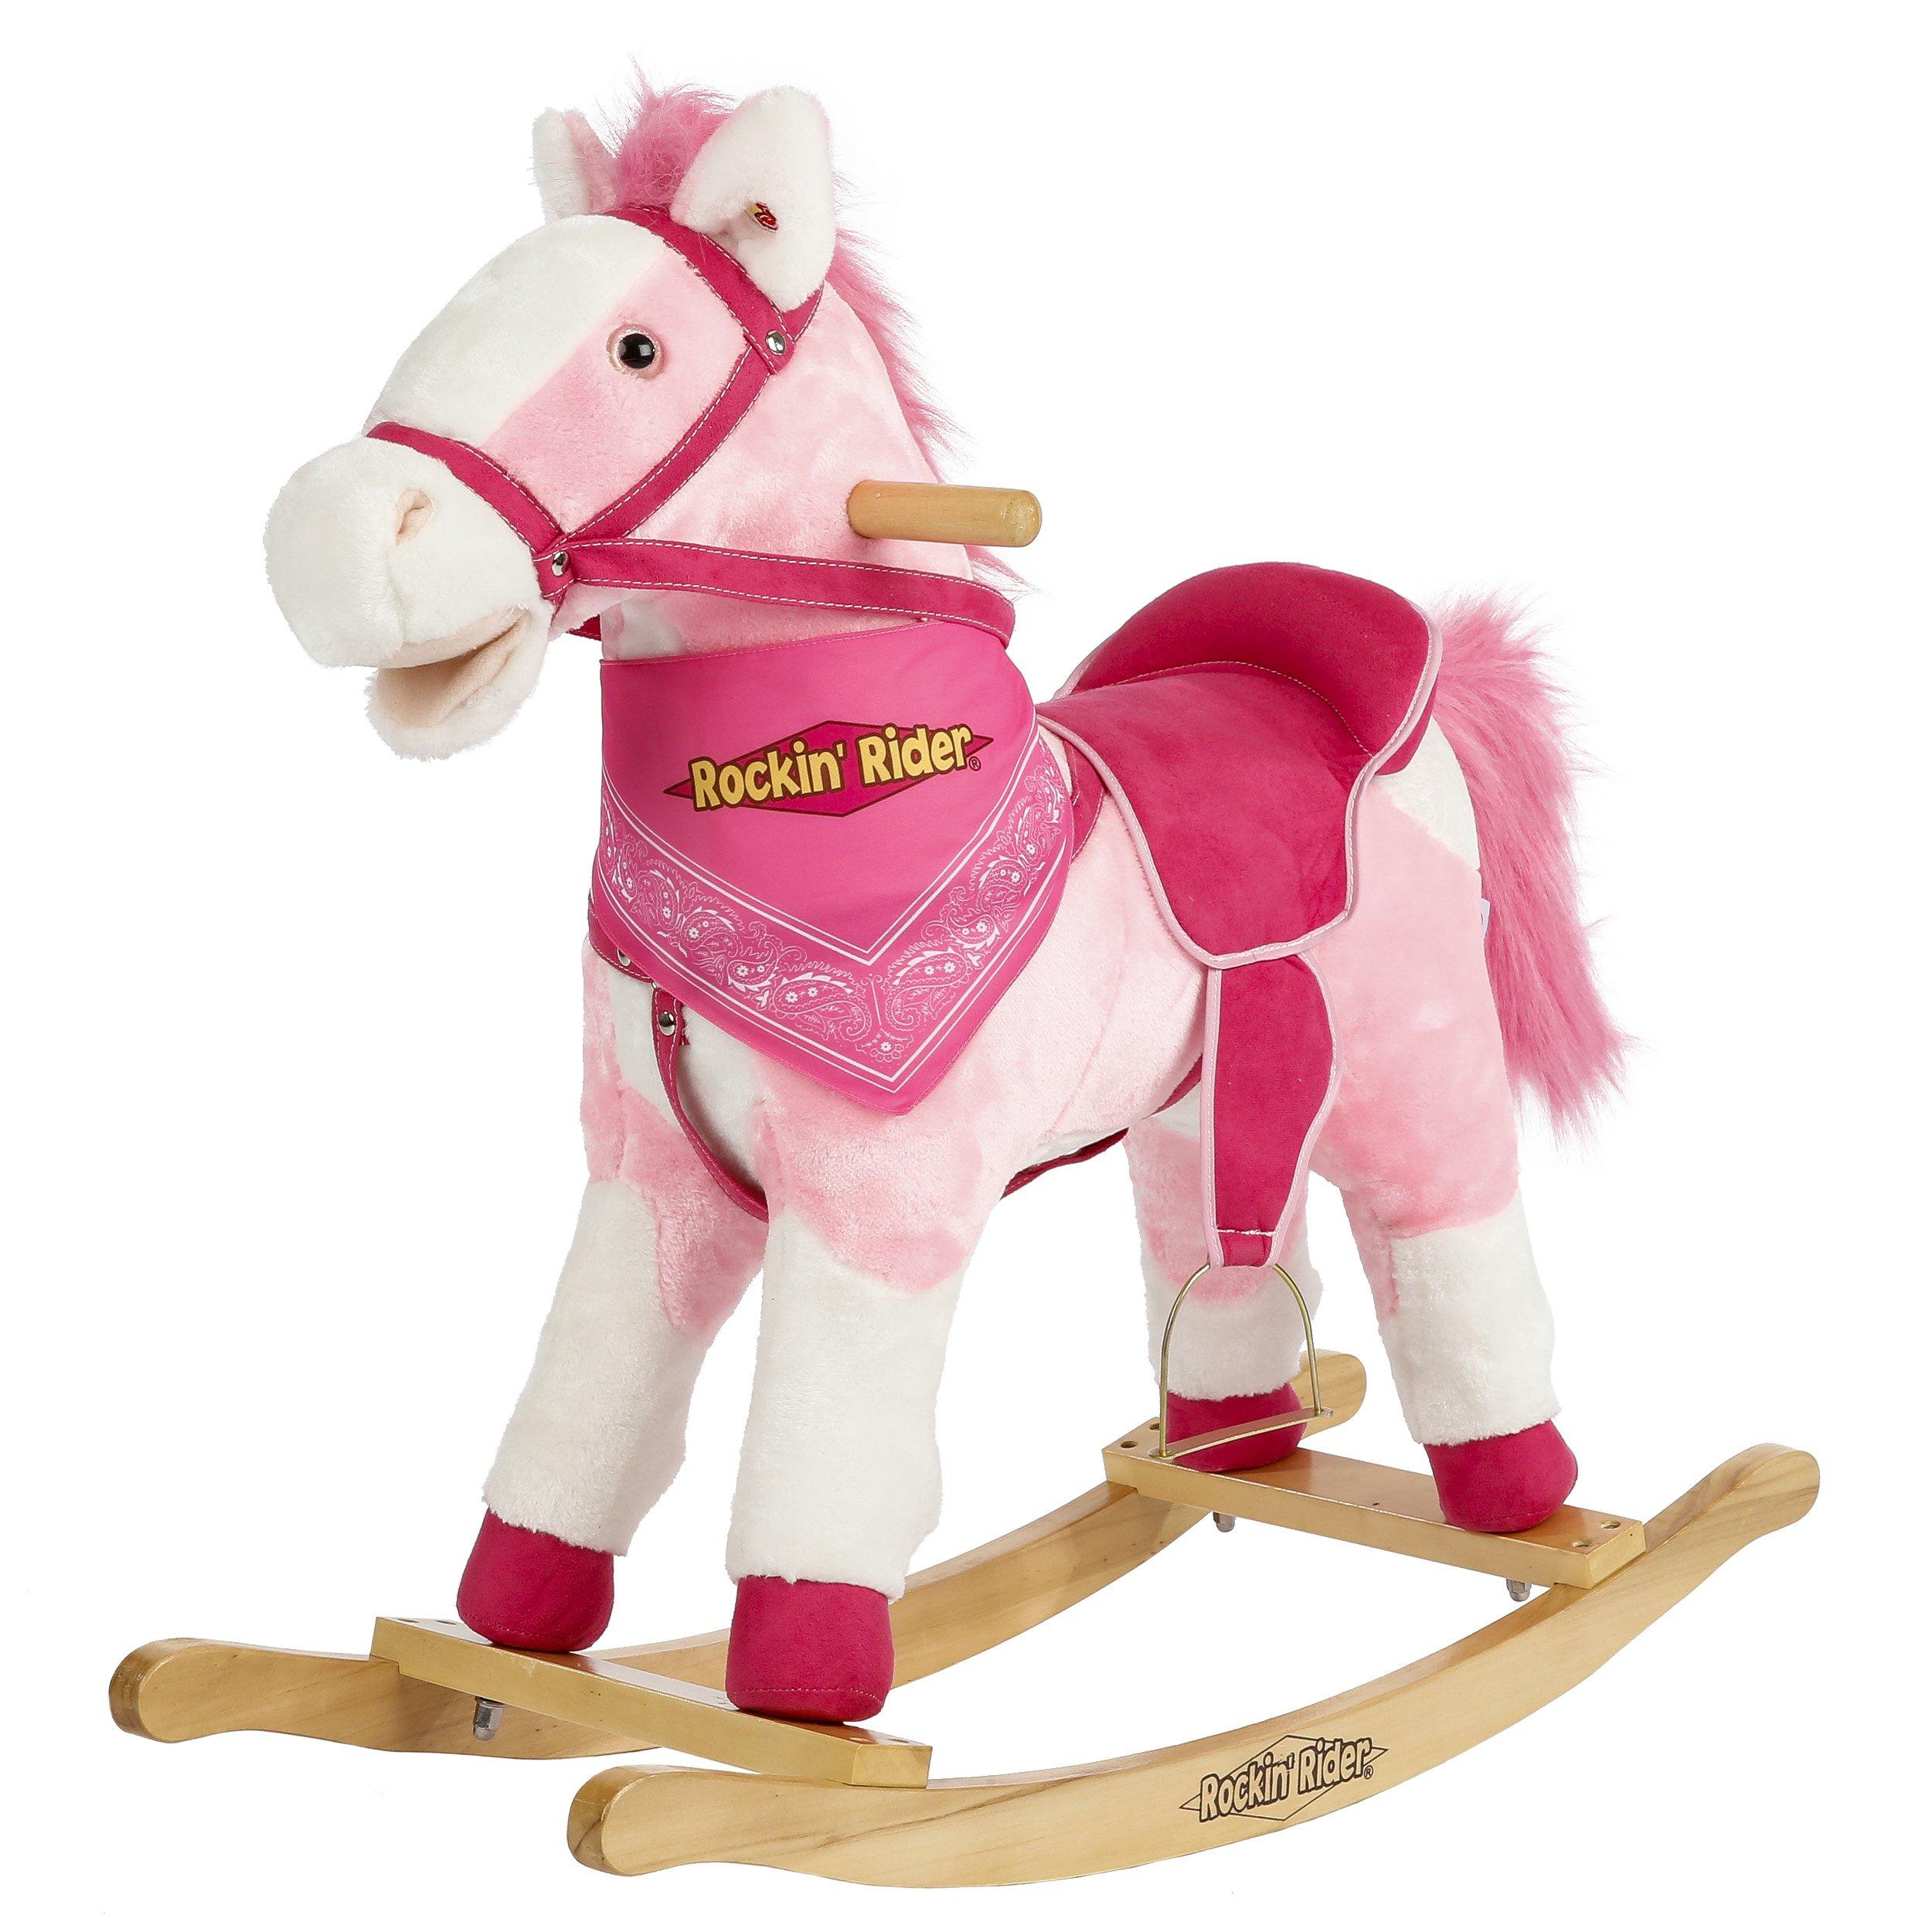 Rockin' Rider Holly Rocking Horse